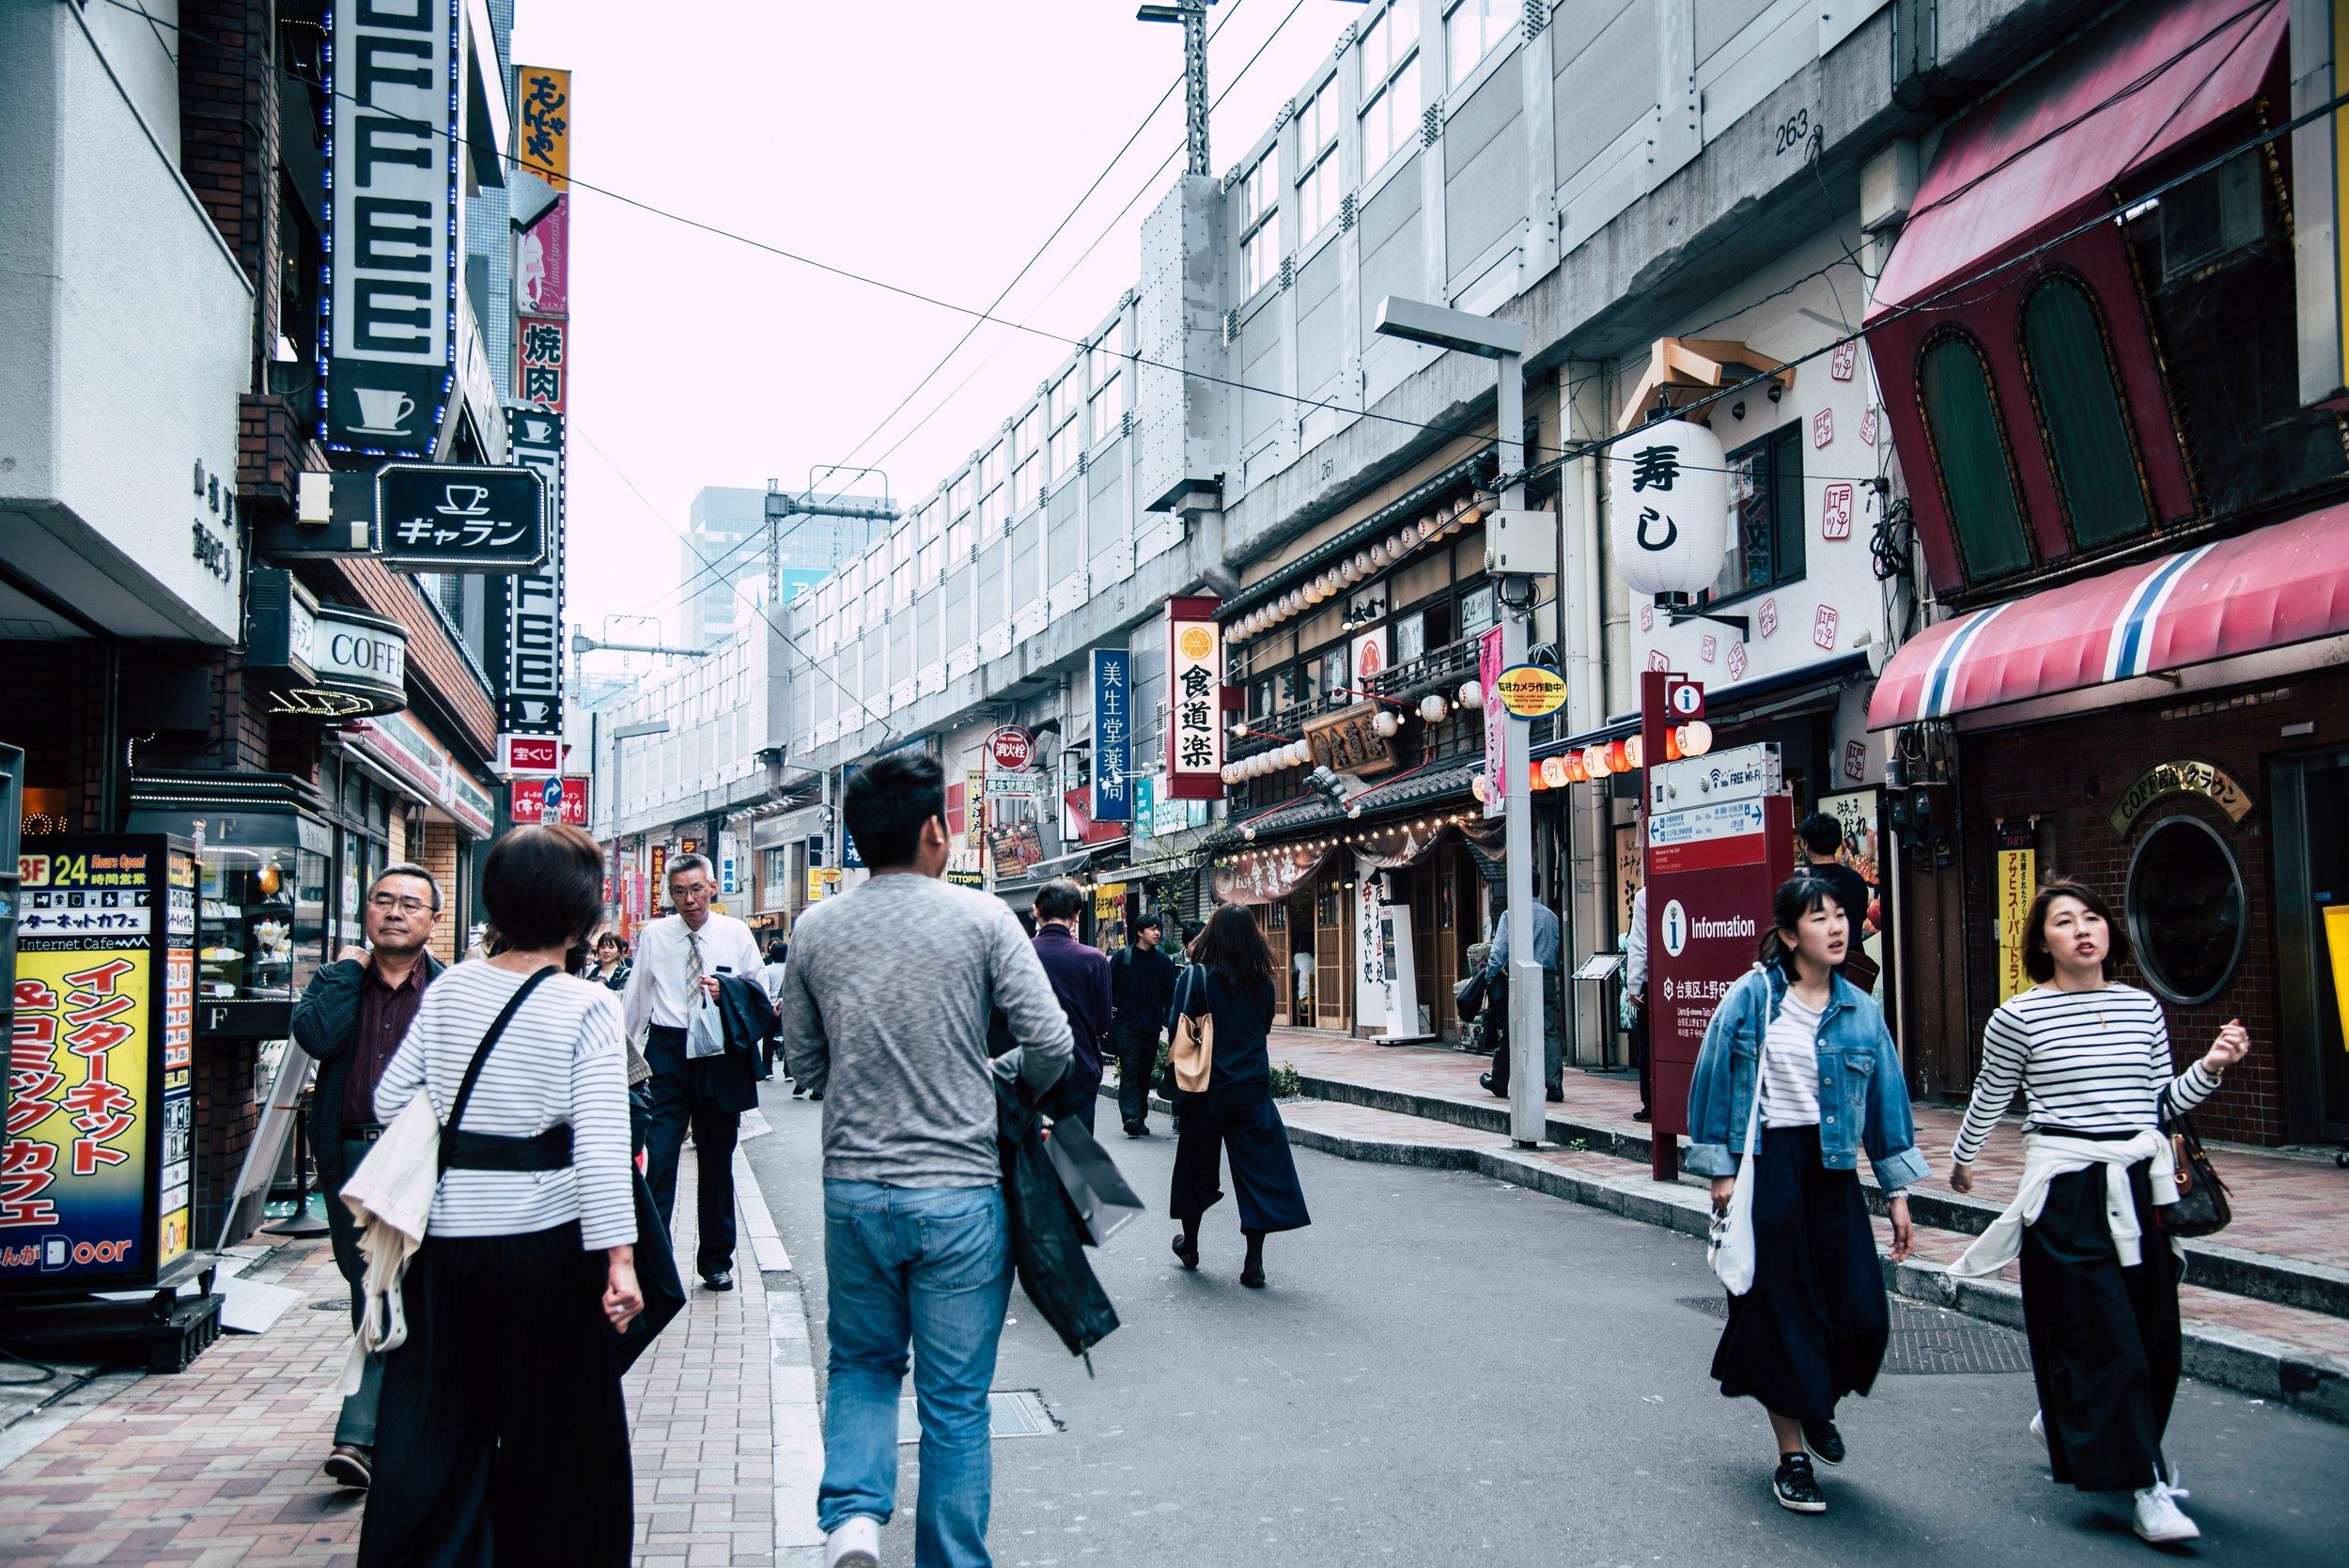 busy-busy-street-city-1191375.jpg